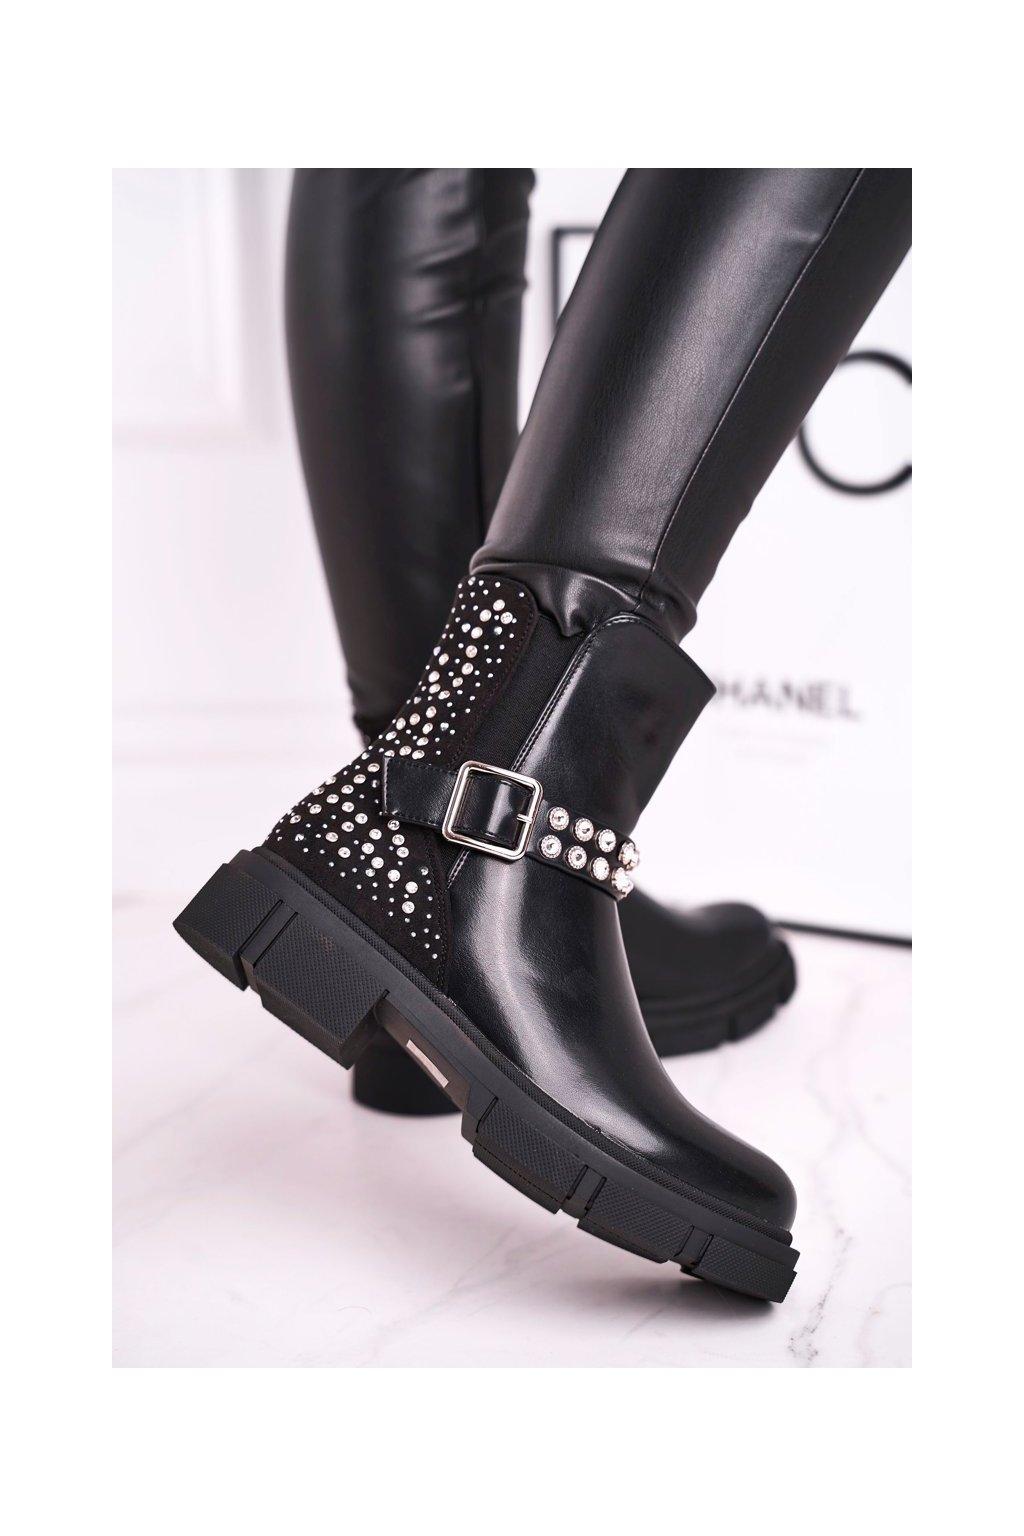 Členkové topánky na podpätku farba čierna NJSK C-162 BLK